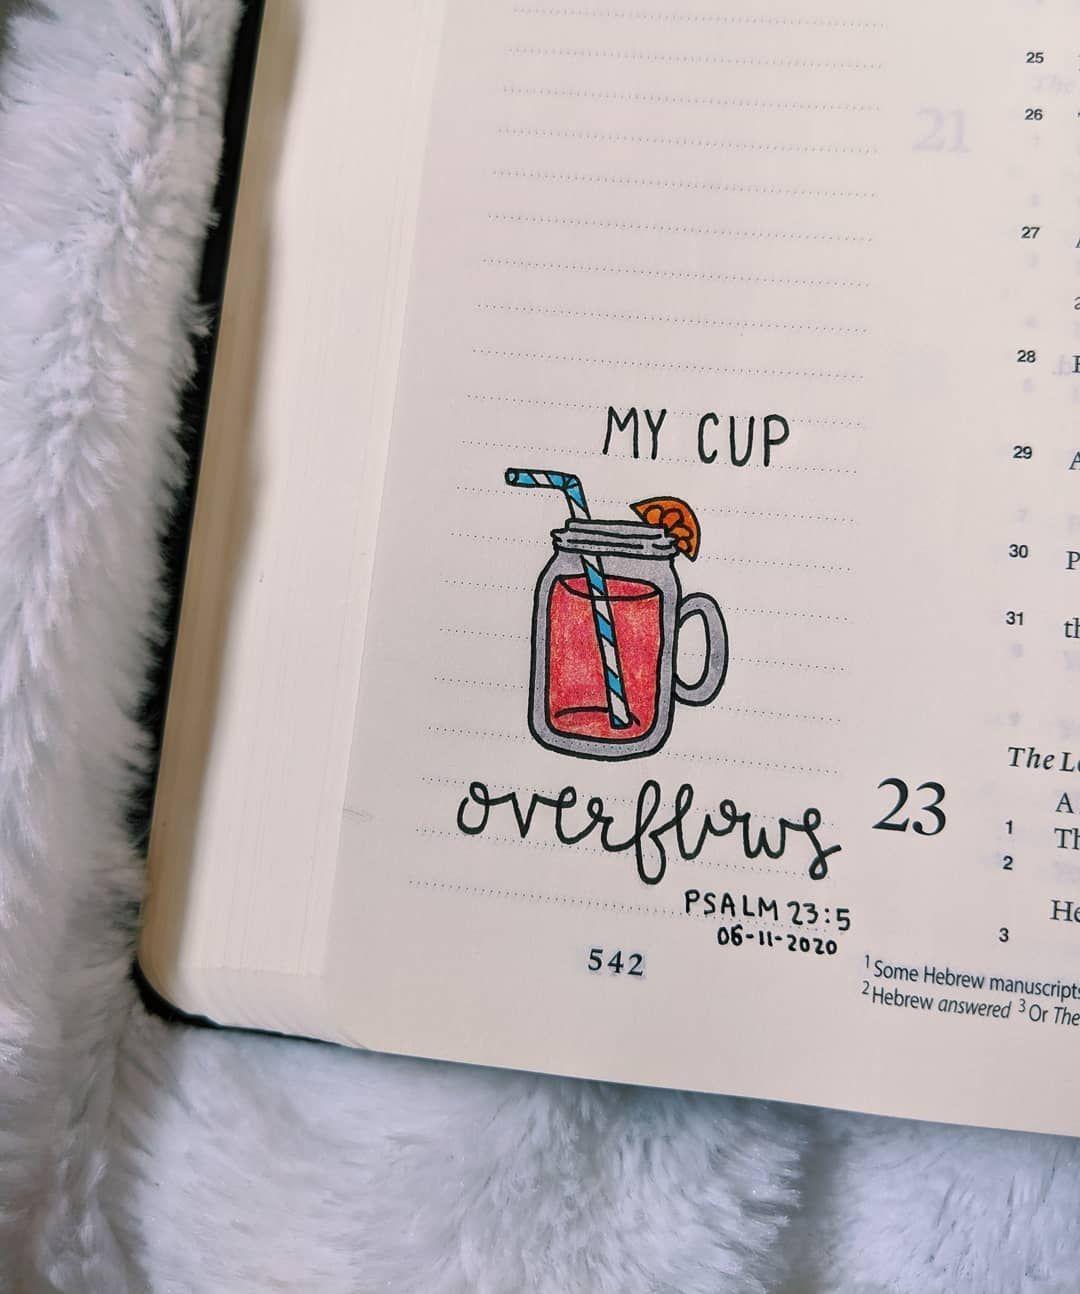 "Emma's Bible Journaling on Instagram: ""Psalm 23:5  #emmasbible #bible #biblequote #biblejournal #biblejournaling #bibleart #biblejournalingcommunity #biblejournalingideas #jesus…"""